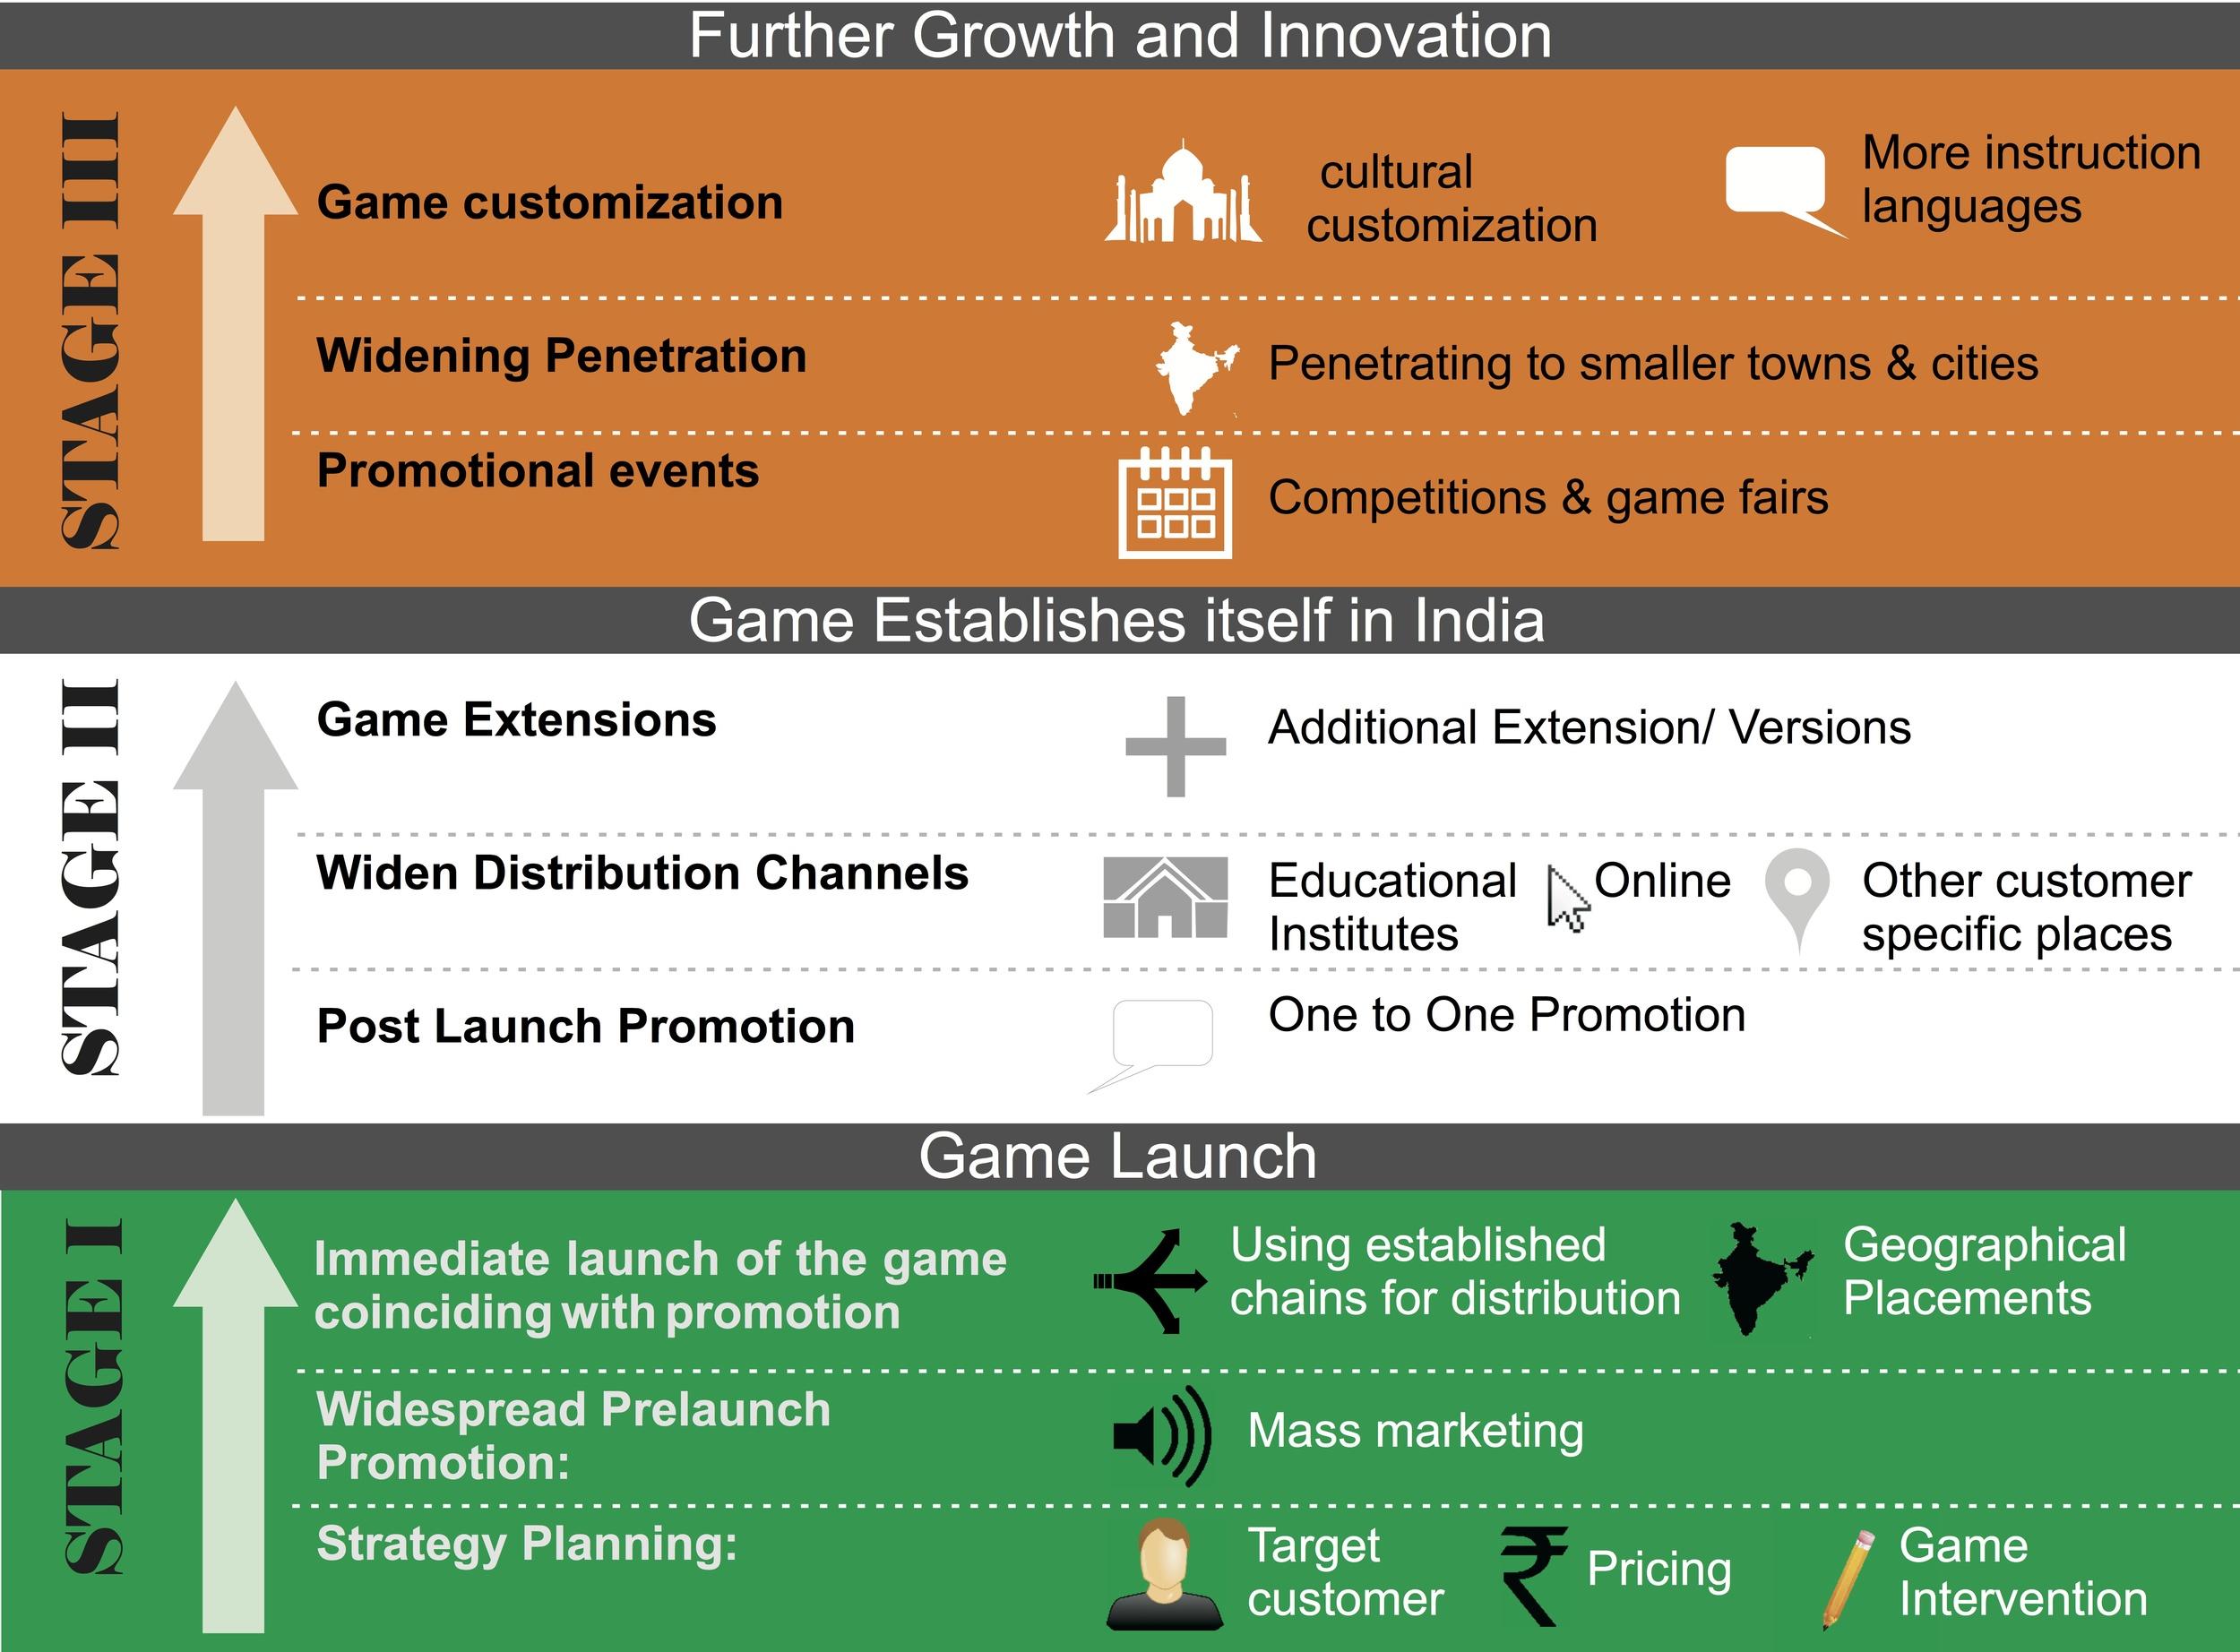 Implementation Plan1.jpg